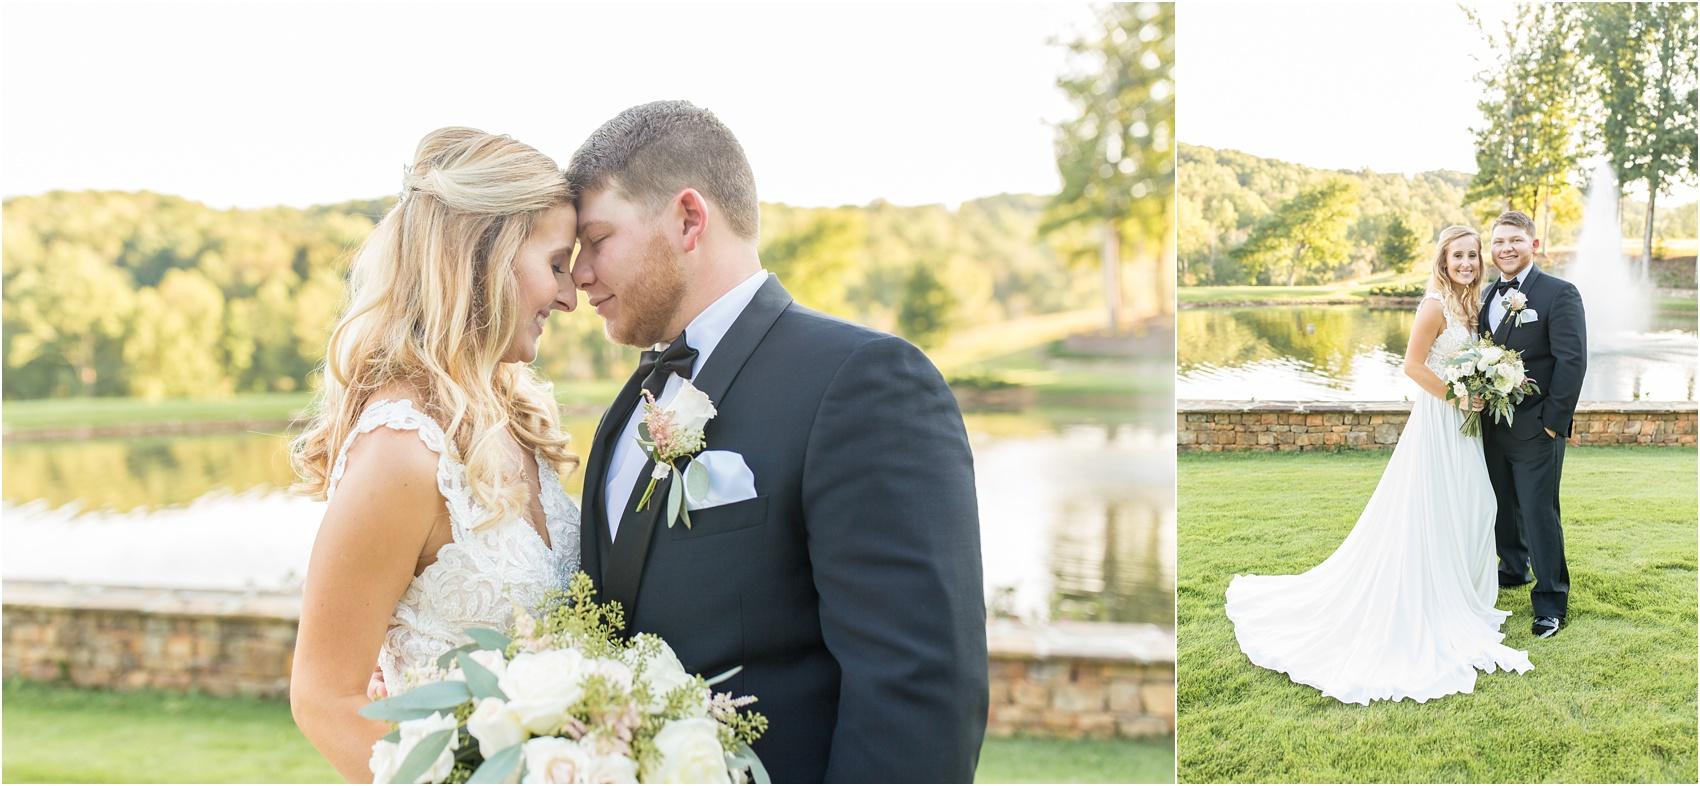 Savannah Eve Photography- Jurek-Woodworth Wedding- Sneak Peek-67.jpg